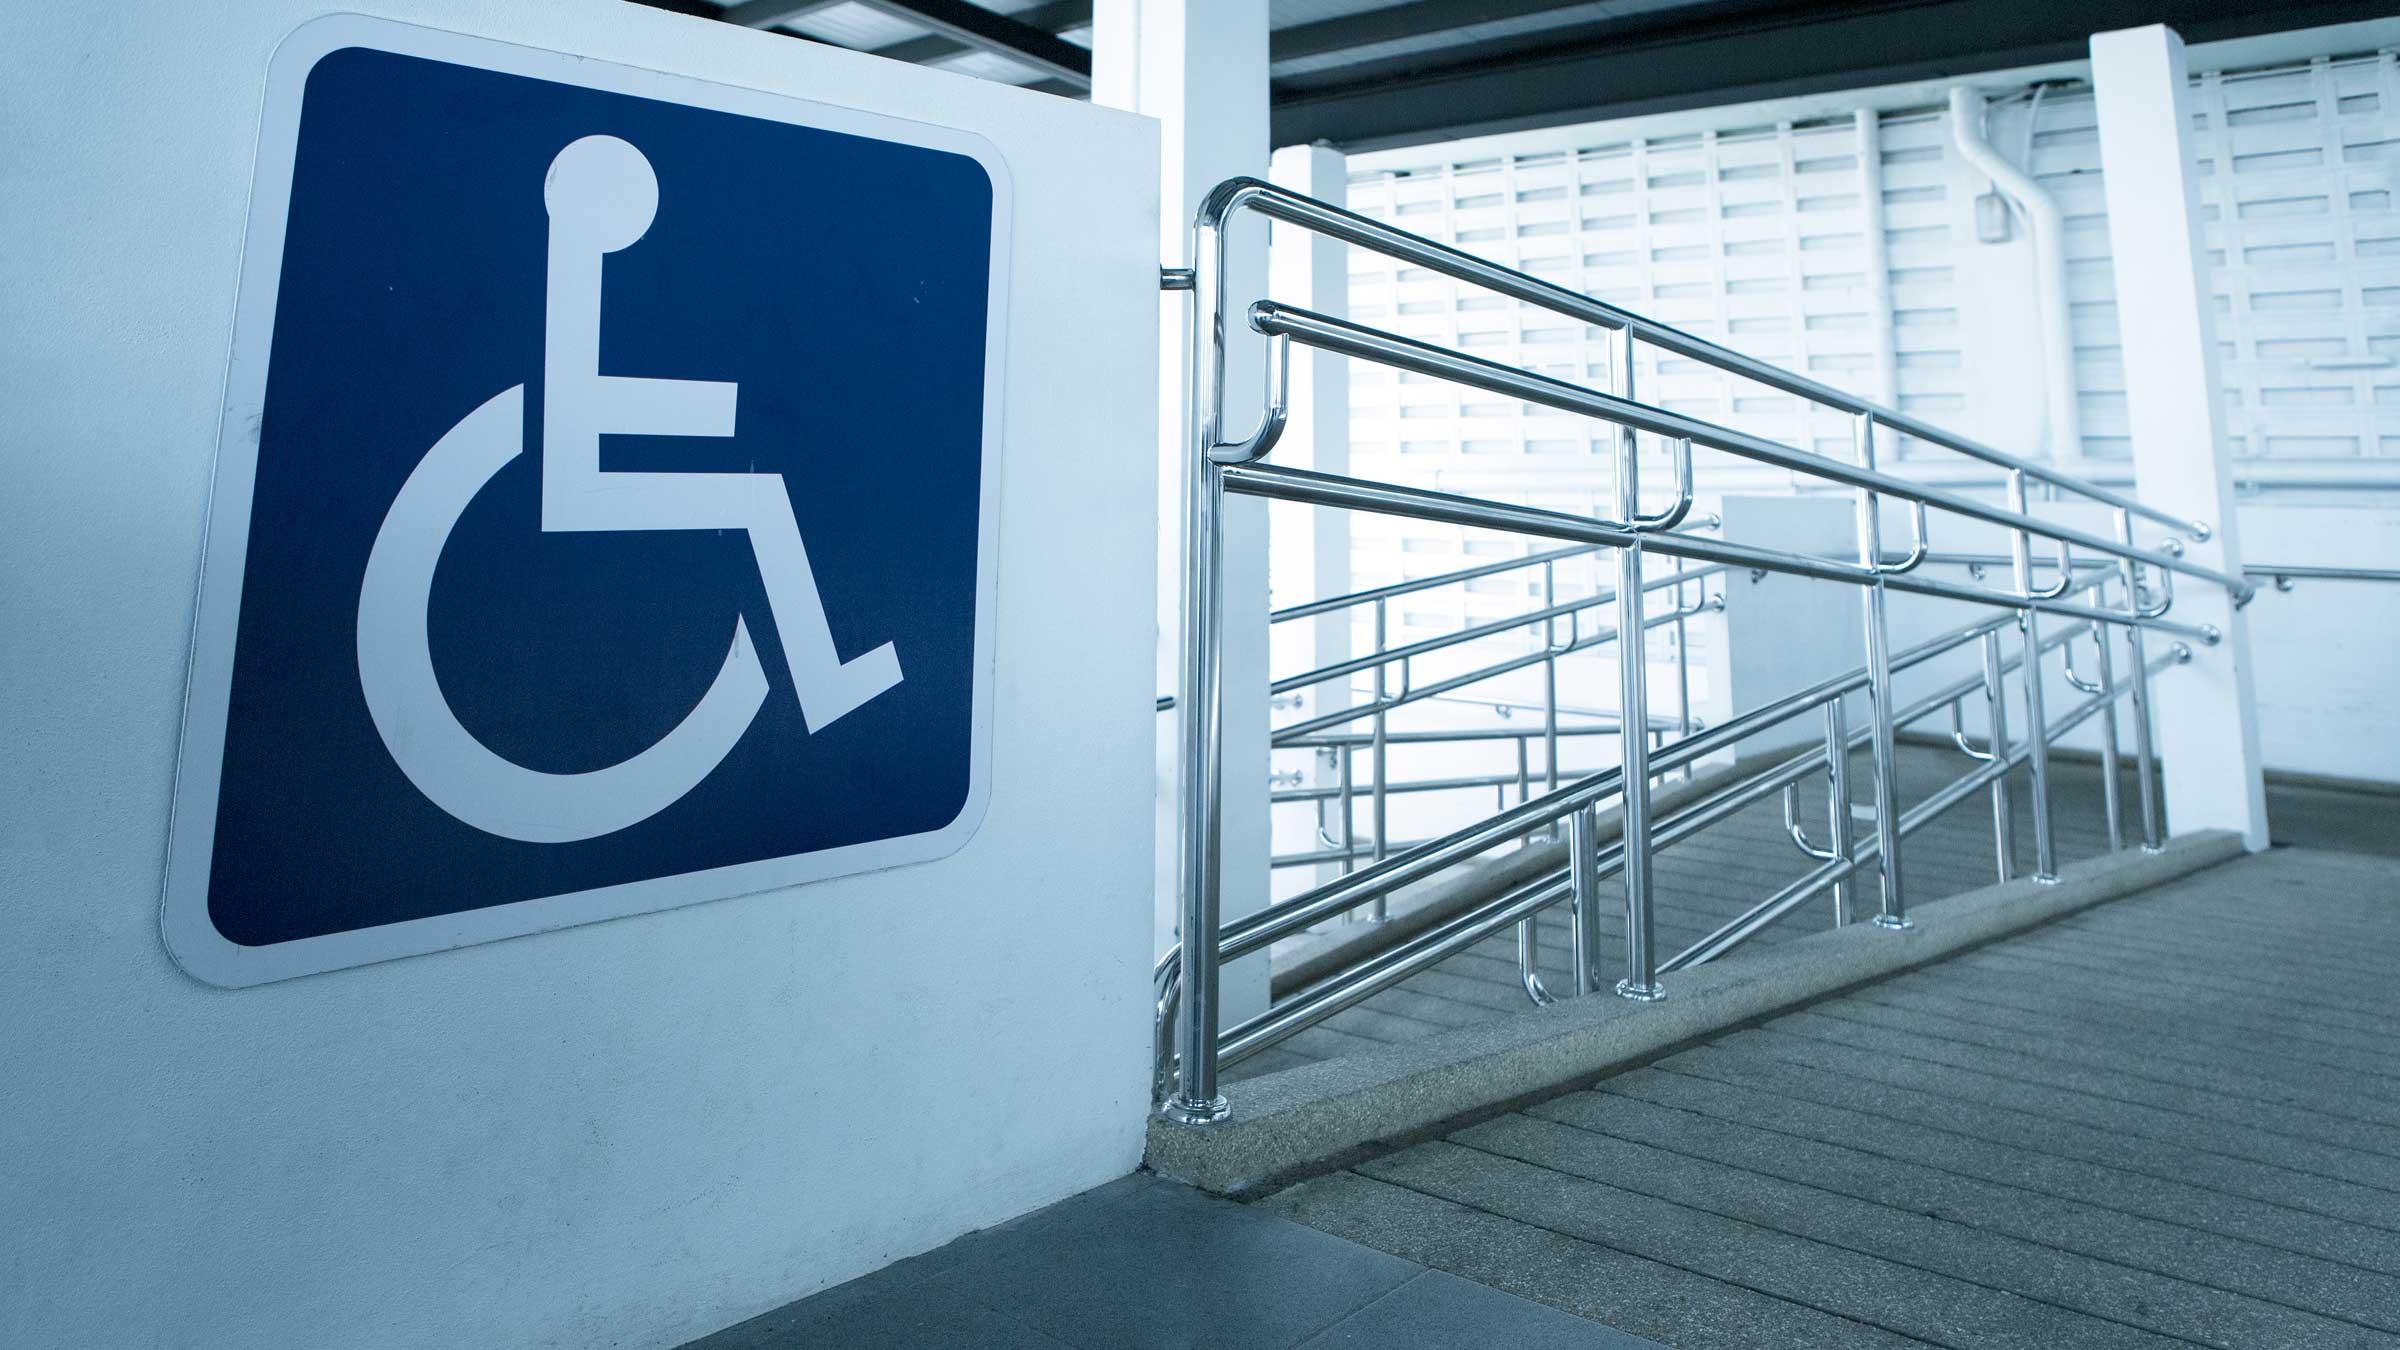 Norme e criteri Rampe per Disabili